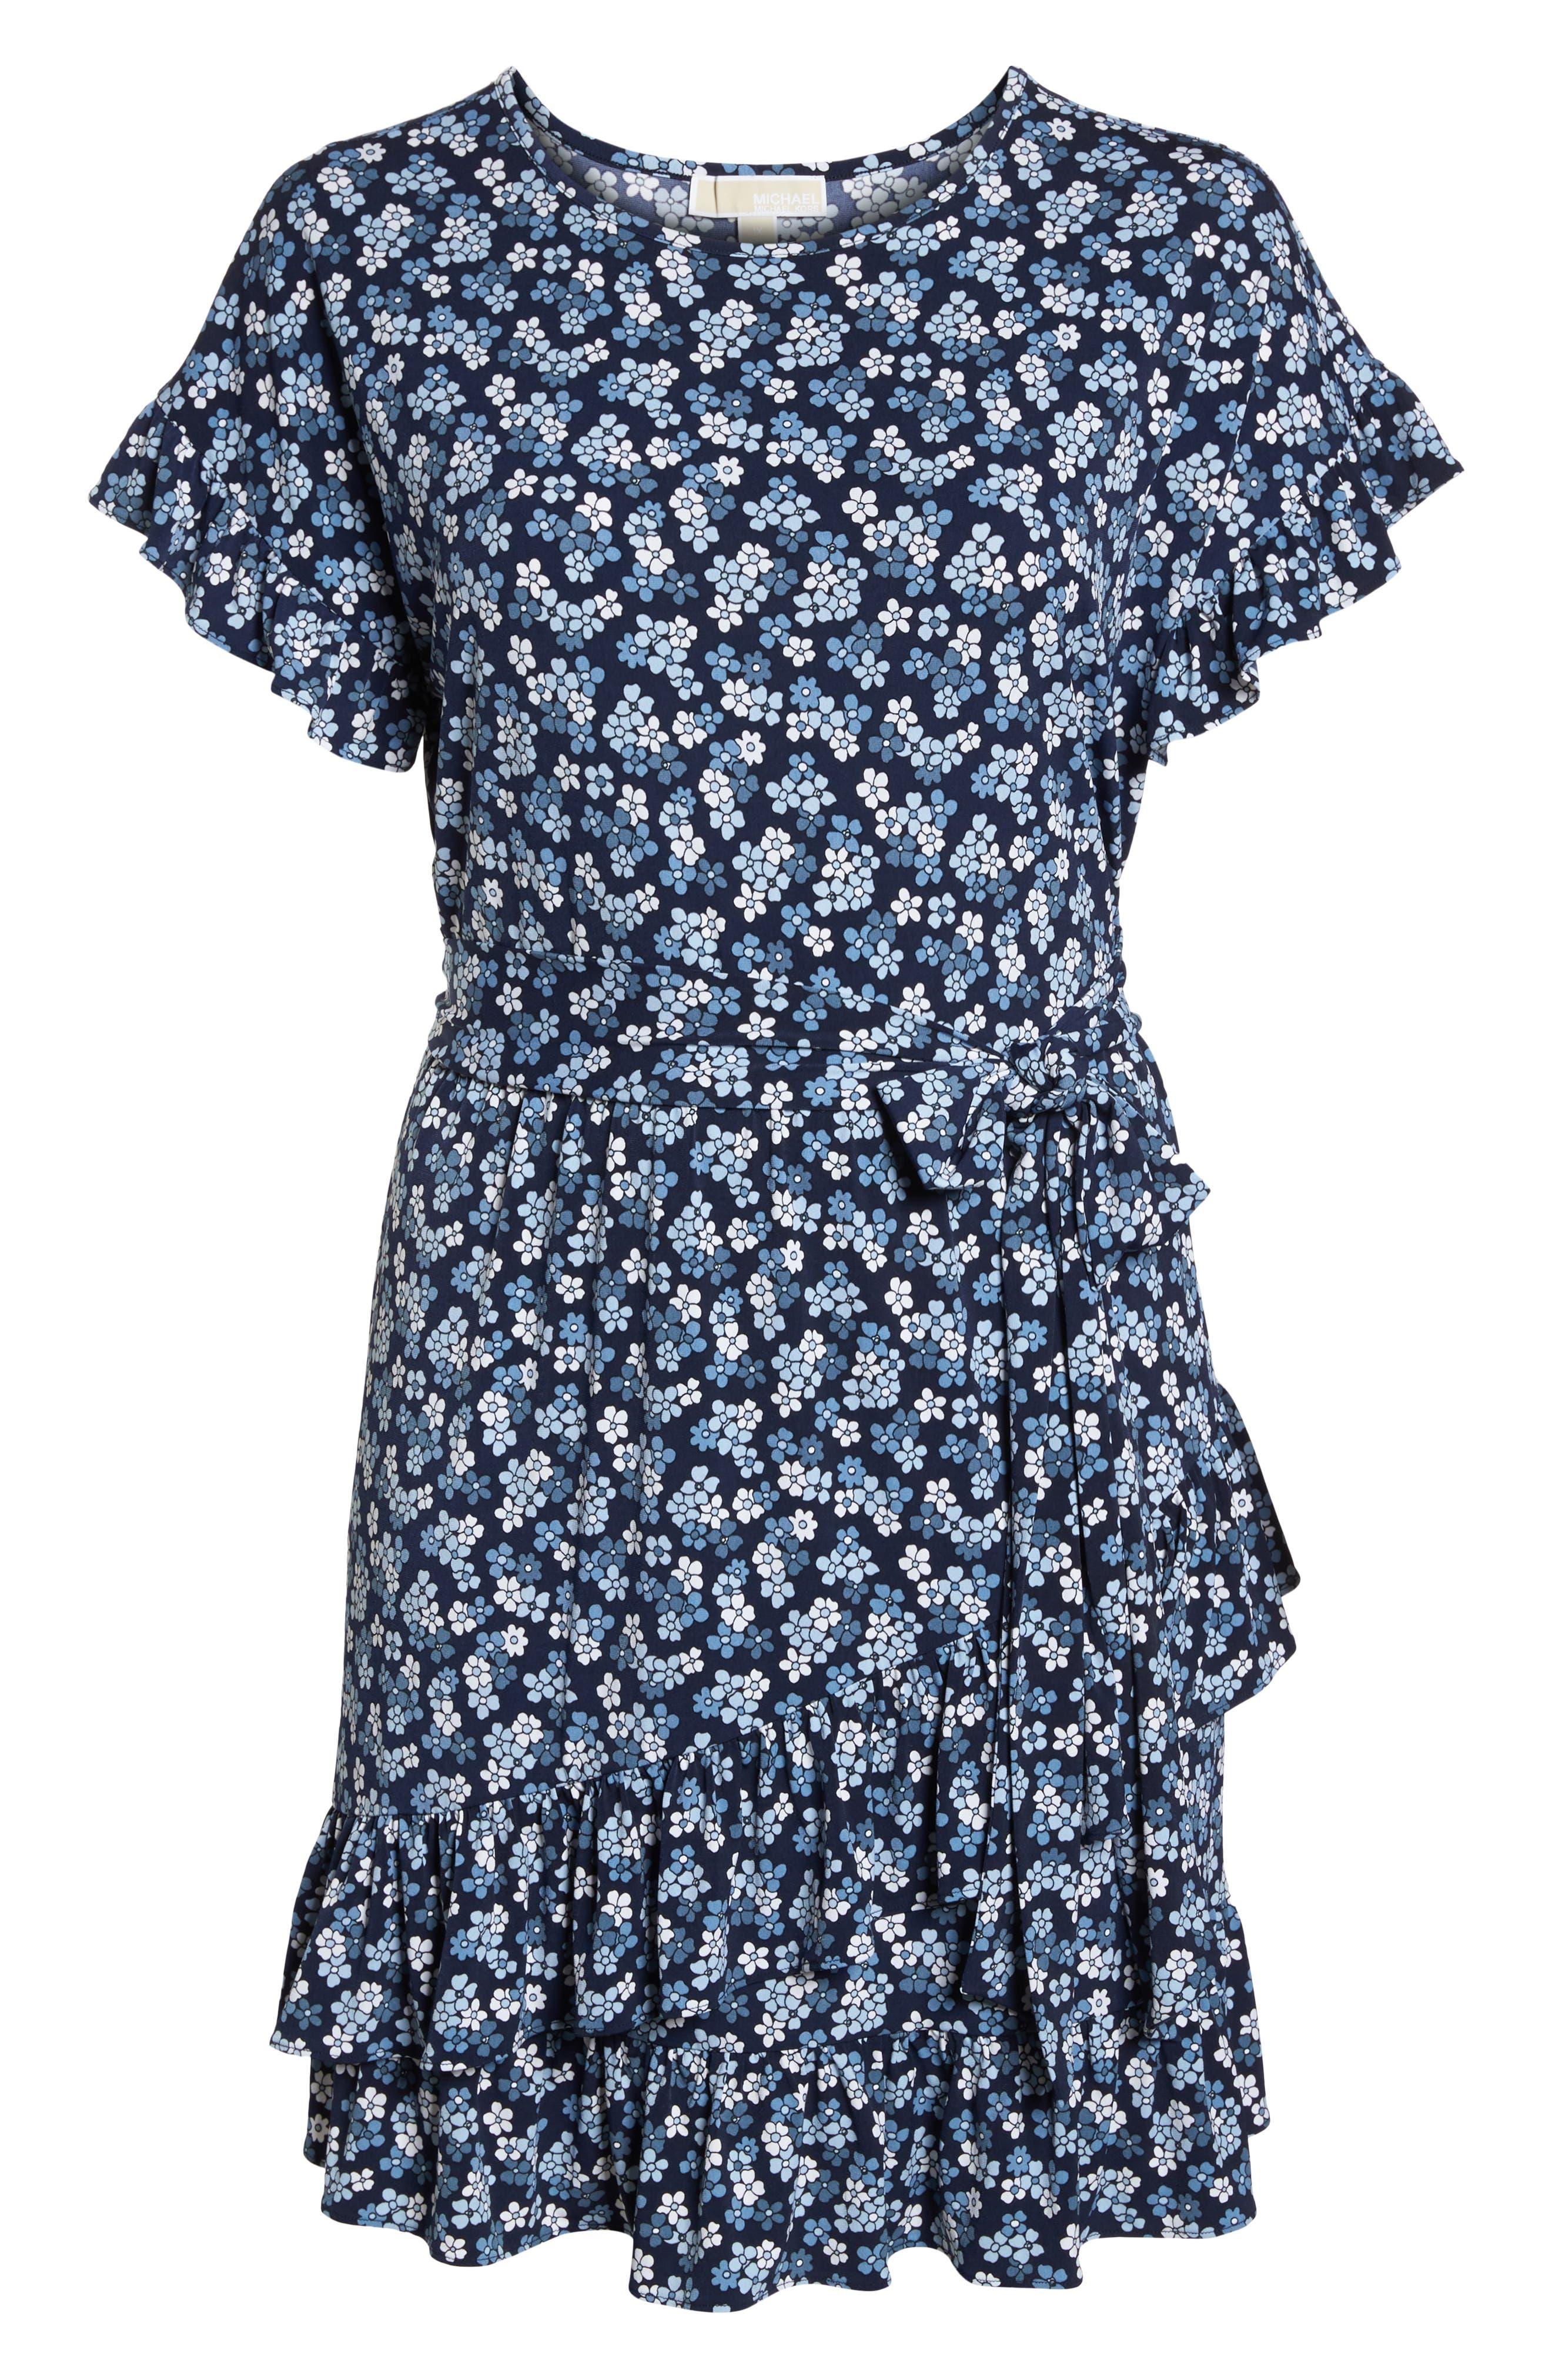 Cherry Blossom Ruffle Faux Wrap Dress,                             Alternate thumbnail 6, color,                             True Navy/ Light Chambray